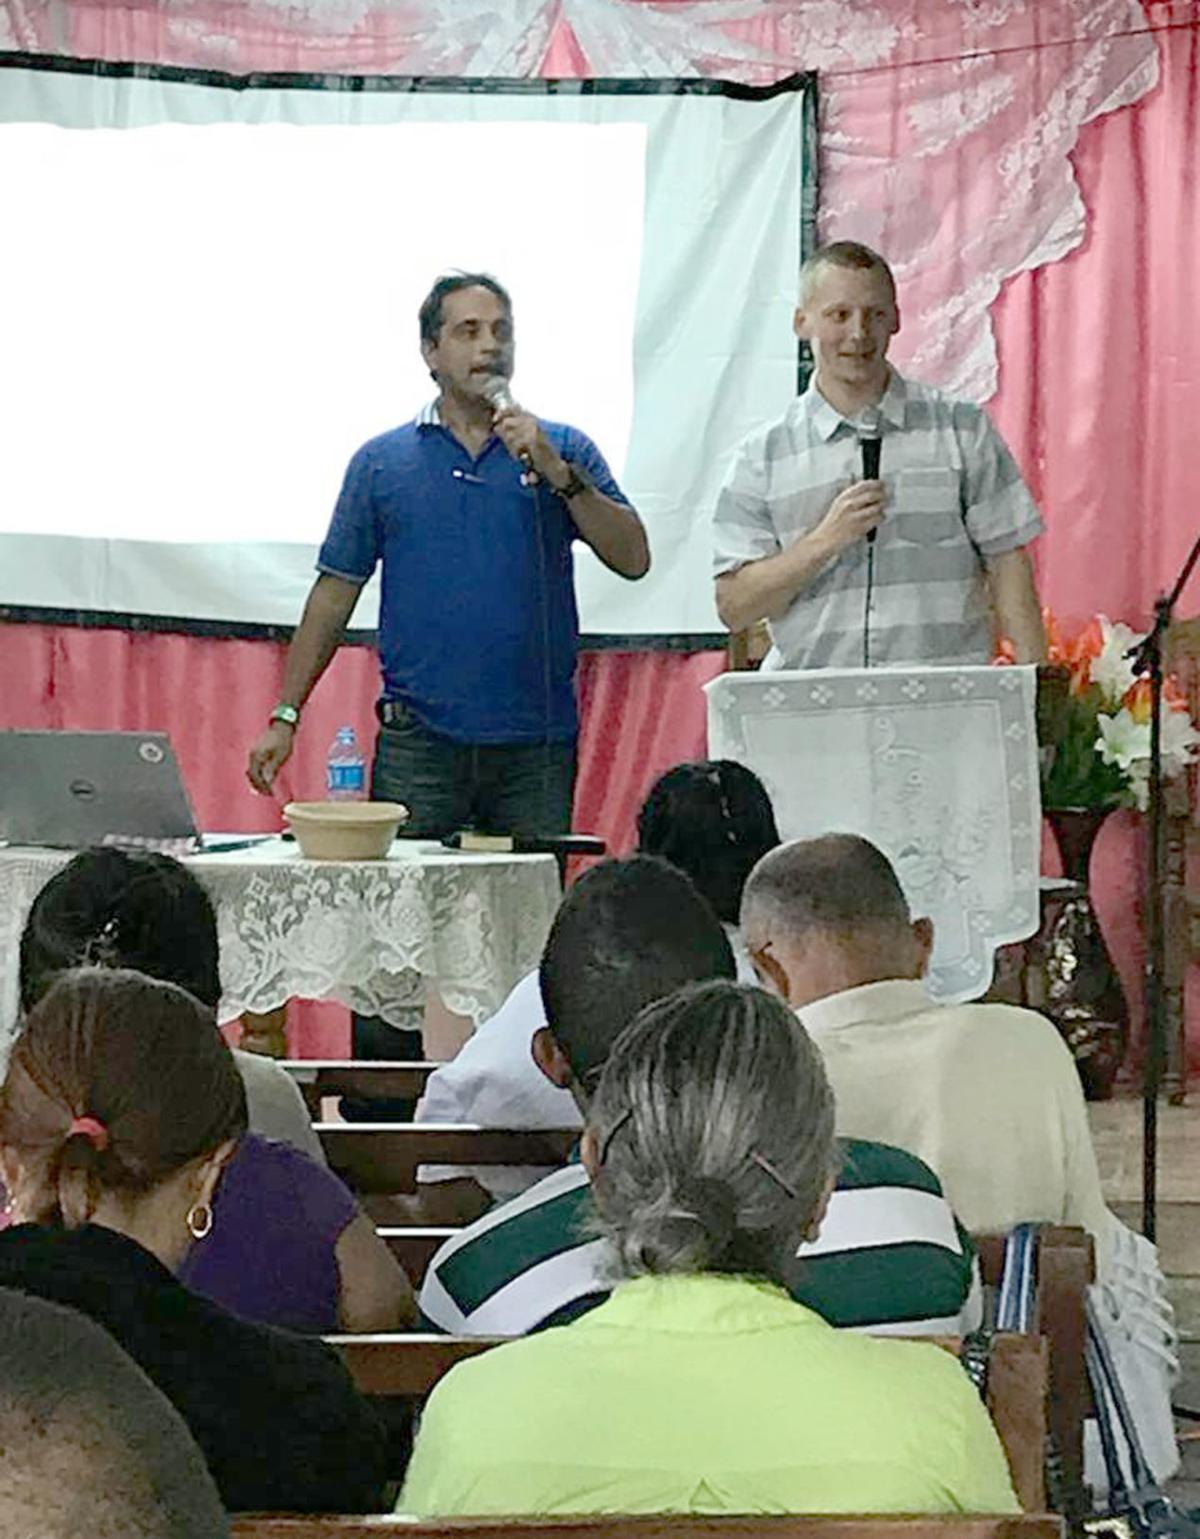 Teaching in Las Tunas